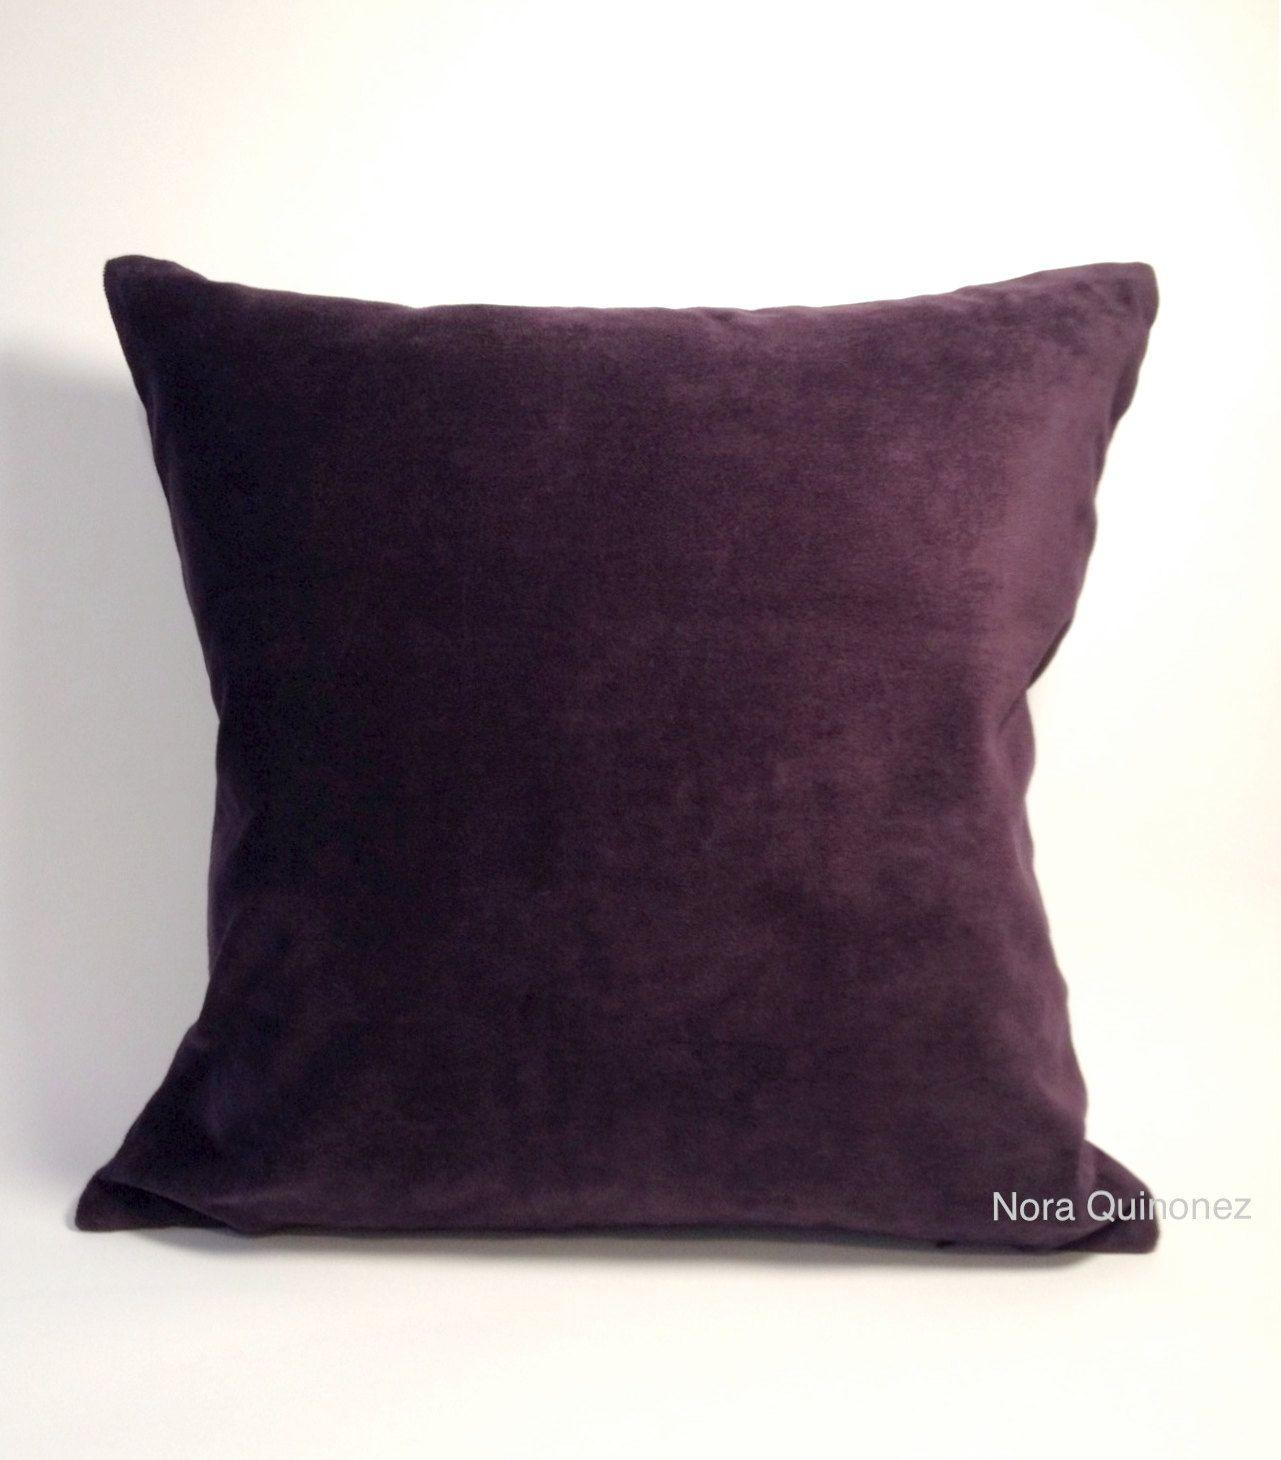 Eggplant Purple Decorative Pillow Cover Medium Weight Cotton Velvet Invisible Zipper Closure